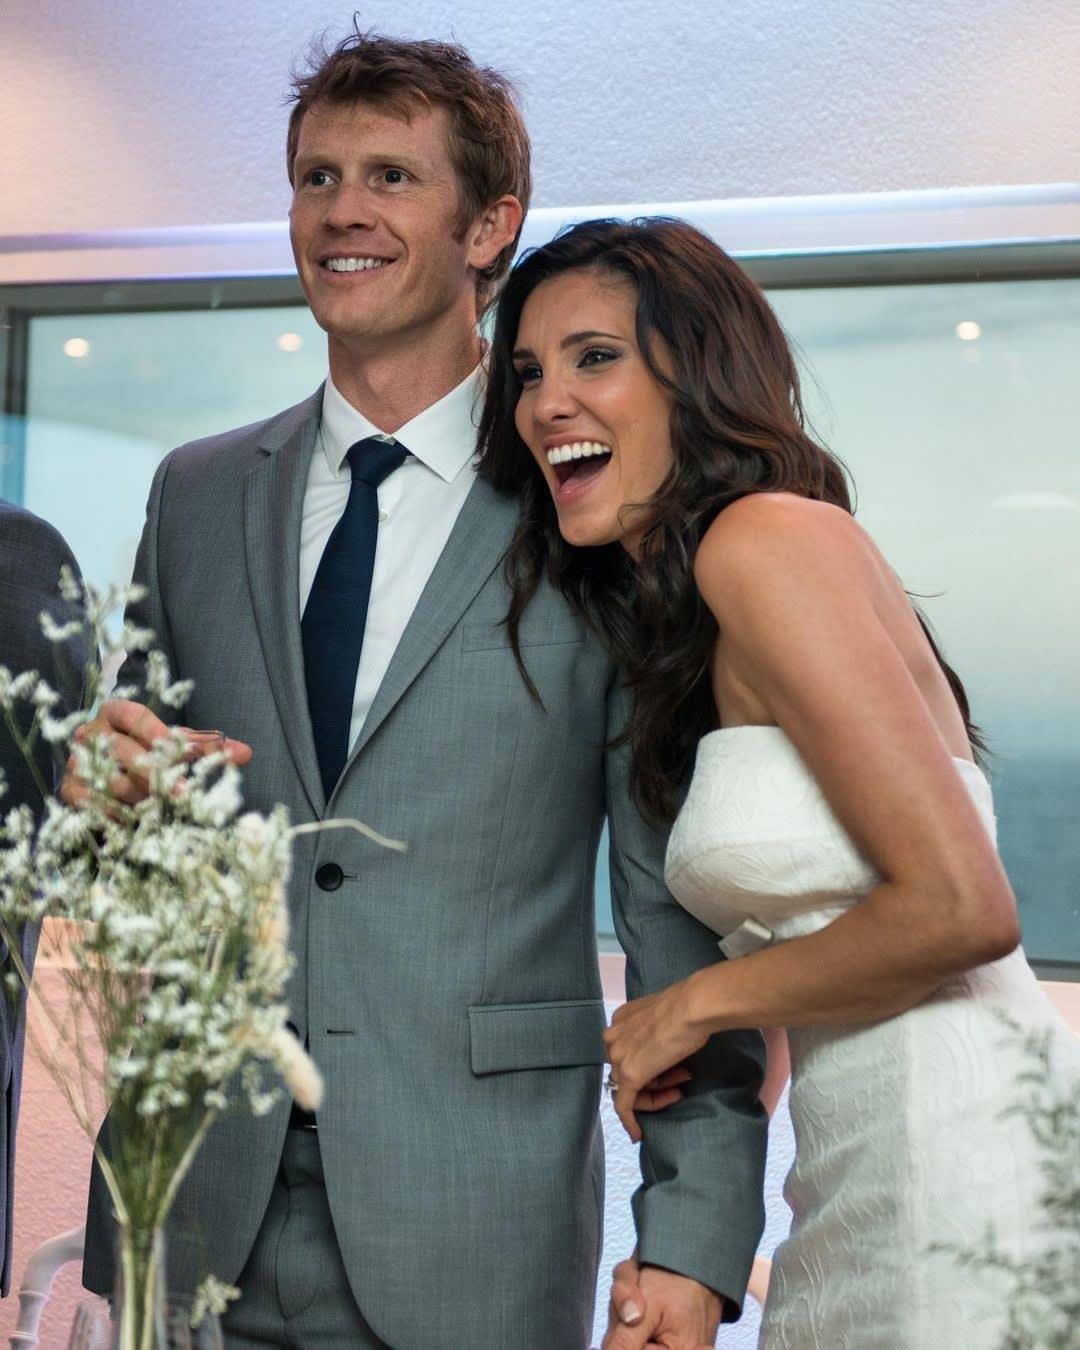 David and Daniela together on their wedding